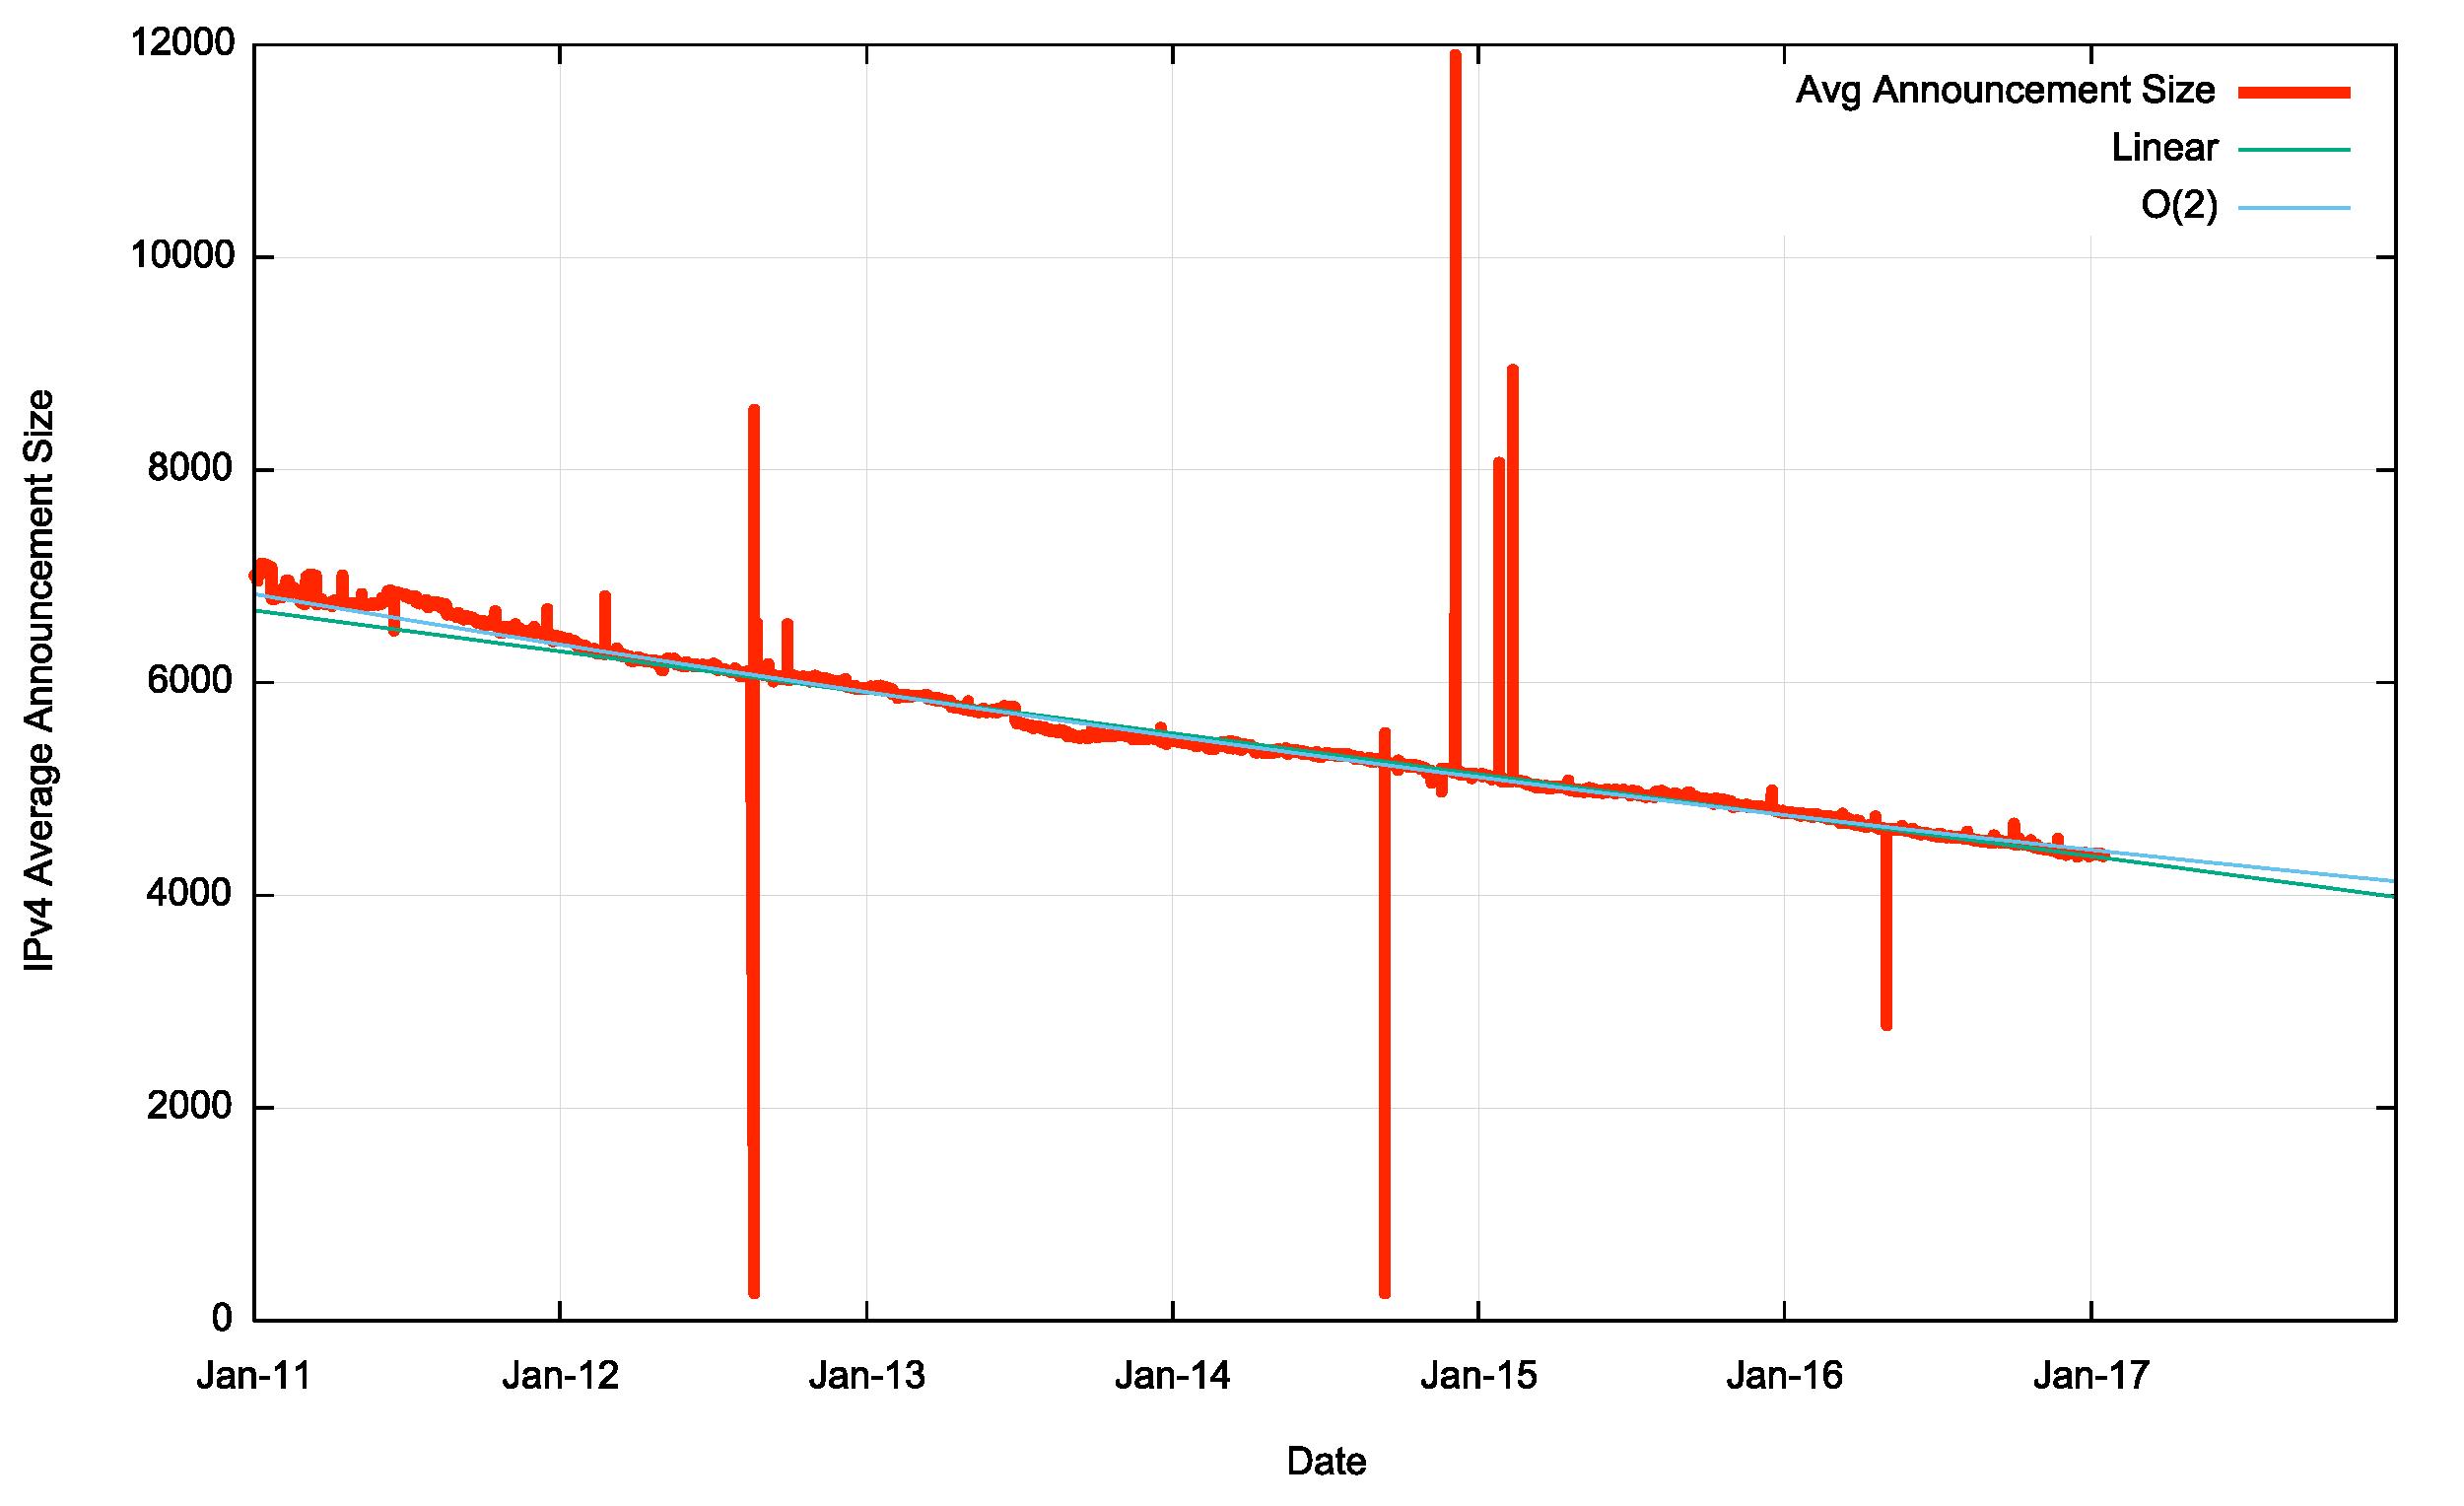 Figure 6 – Average Announcement Size